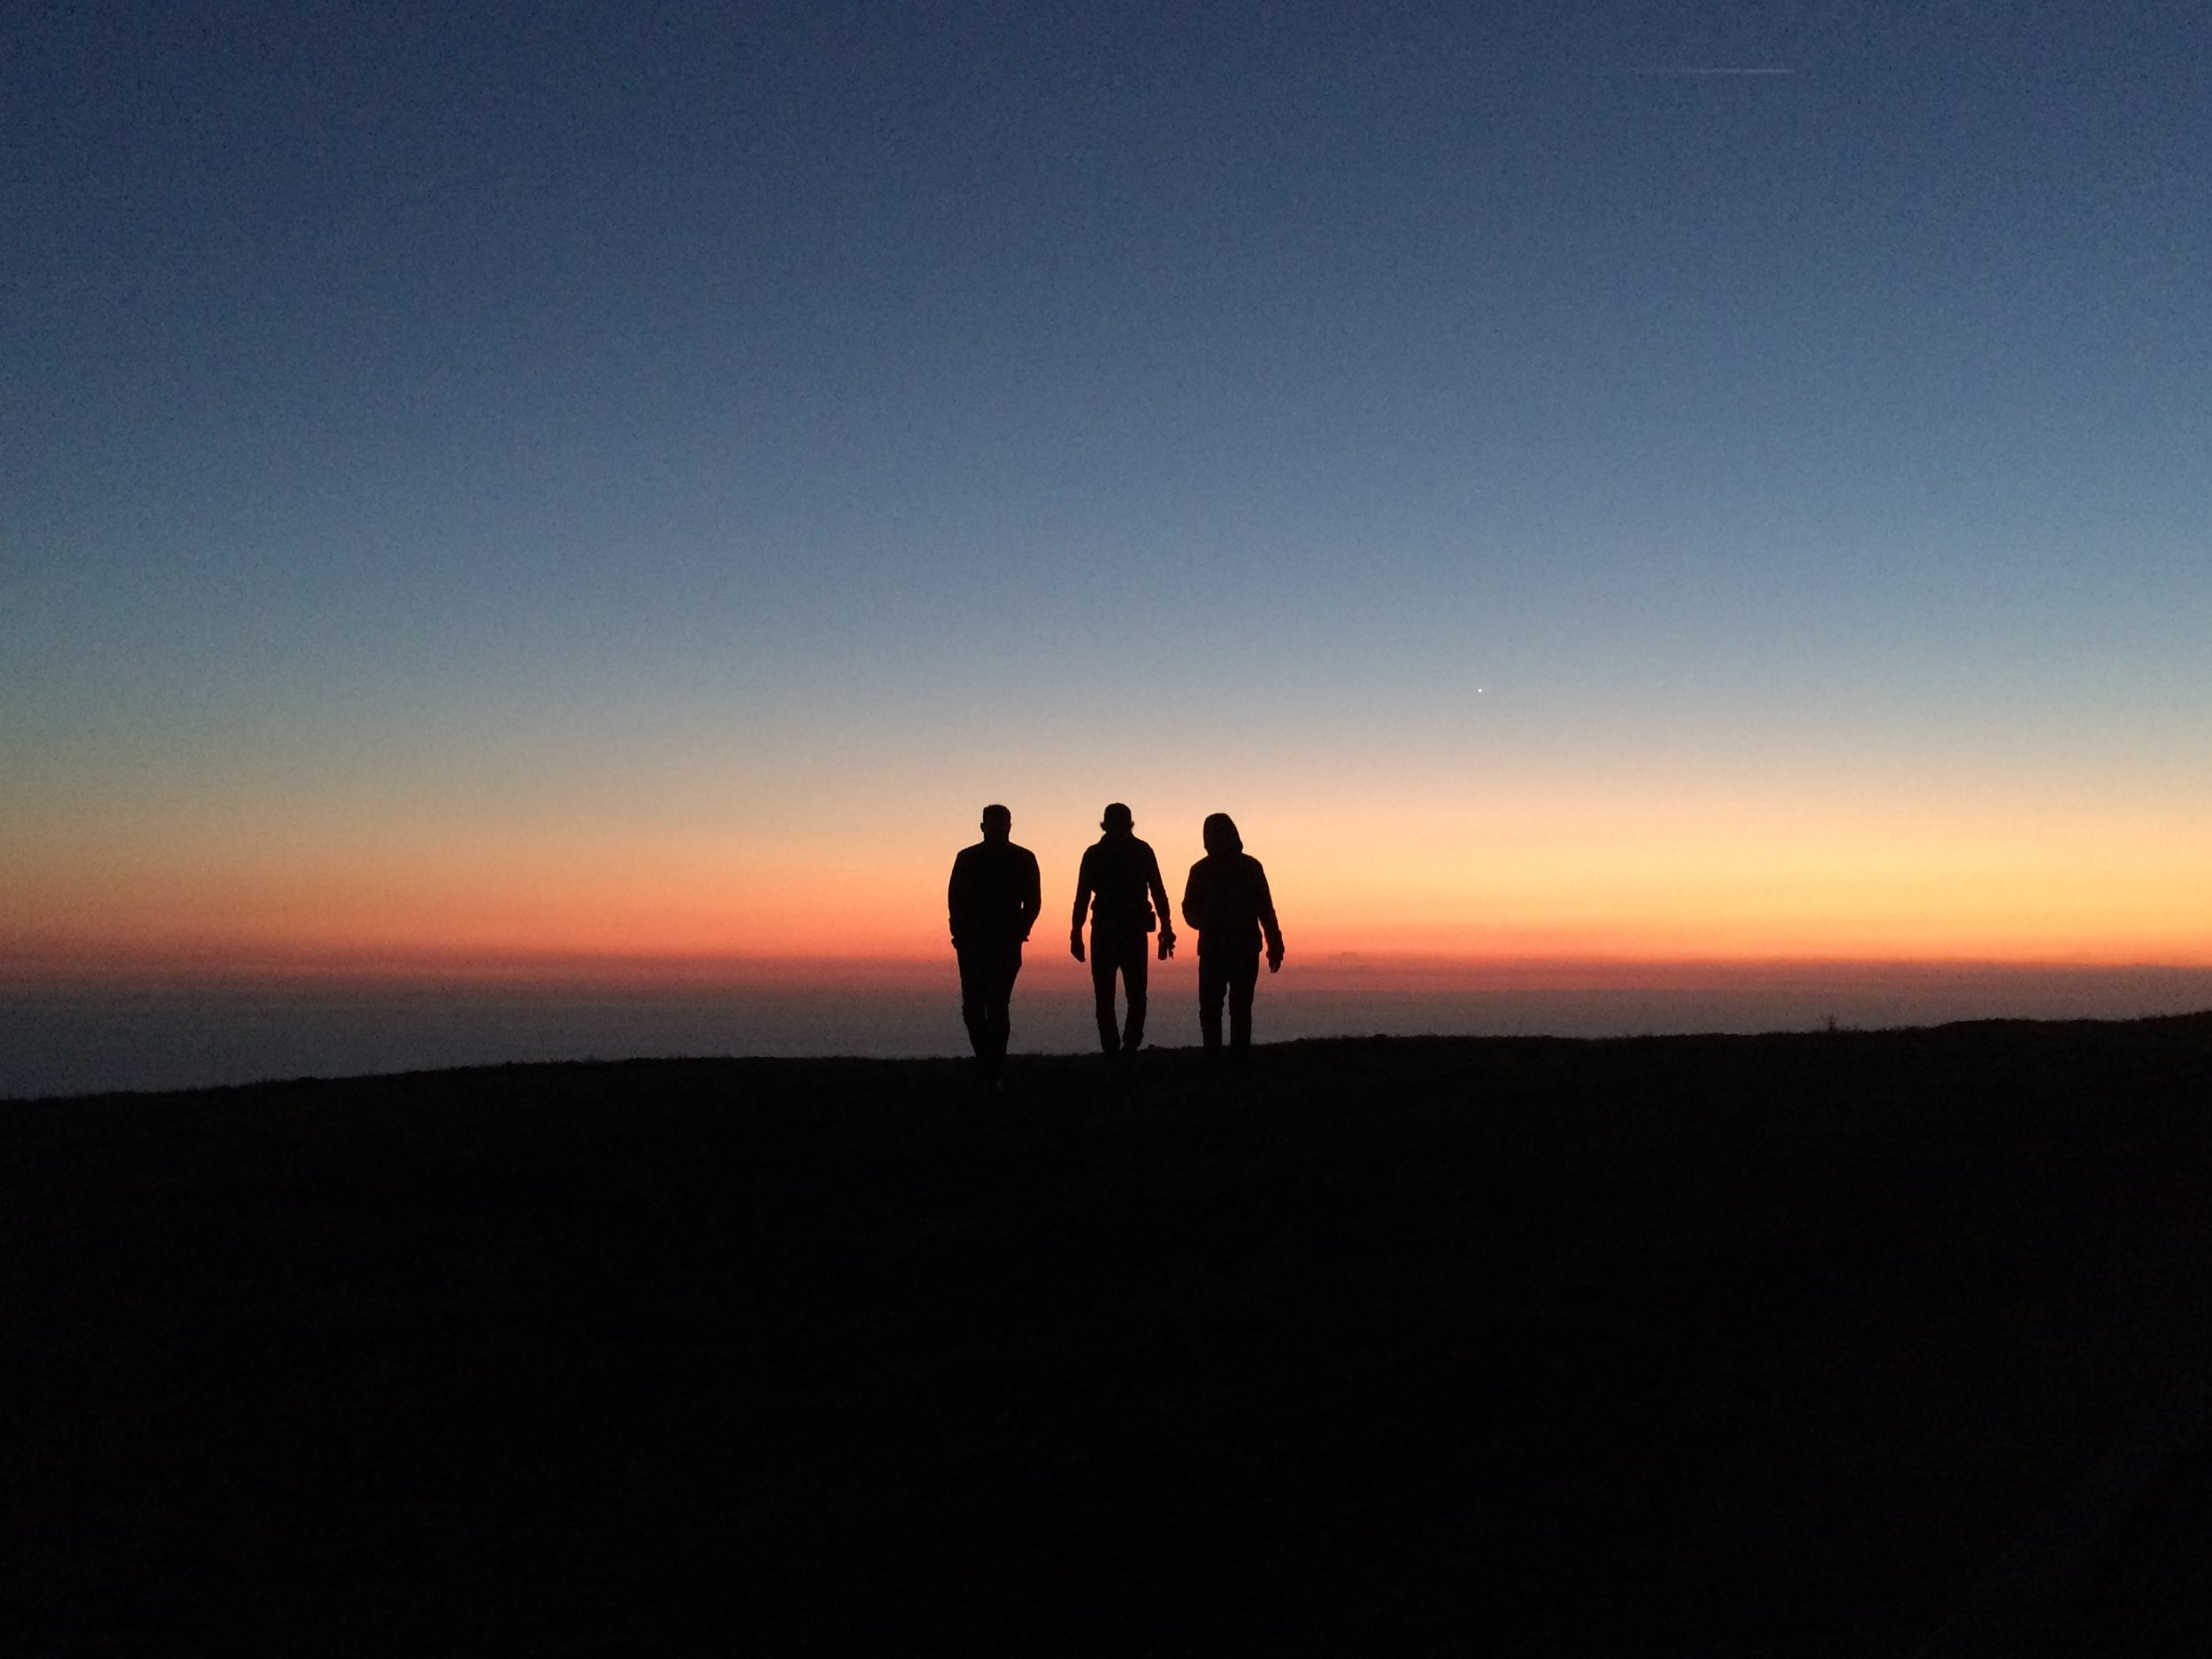 Sunset walk back from Kai's Peak in Malibu. Robbie, Kai, me. Photo by Lara G.